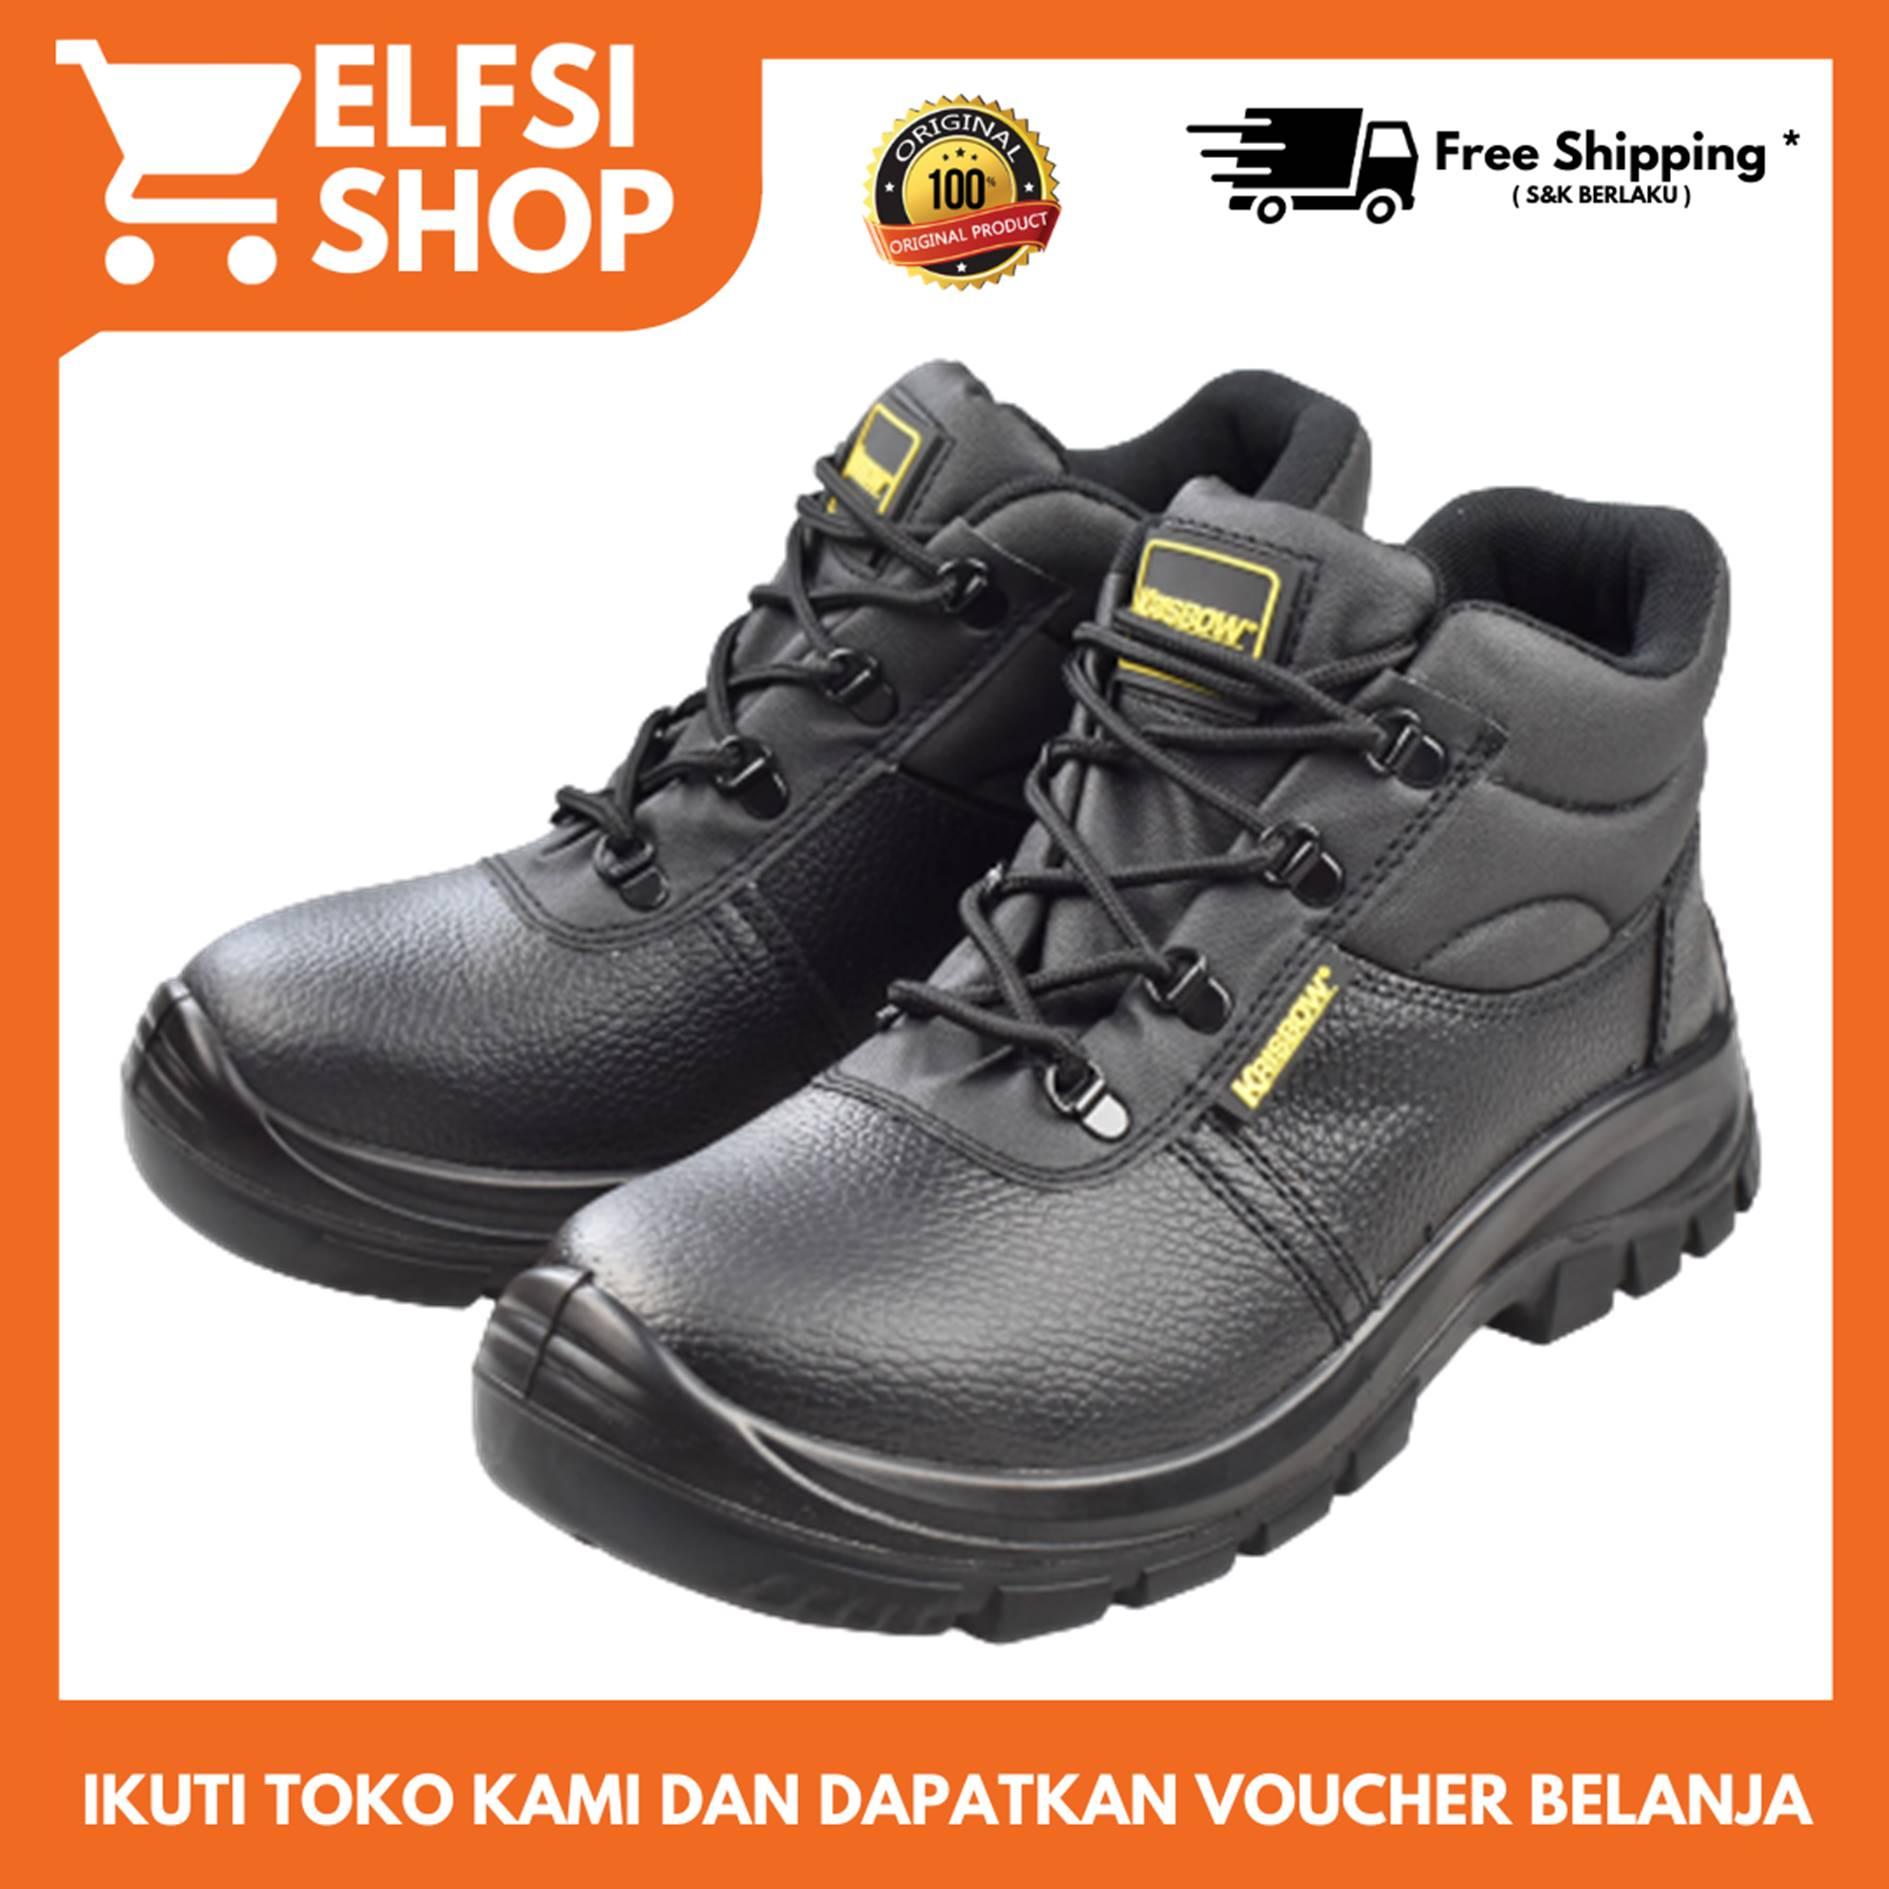 krisbow – sepatu pengaman / sepatu safety maxi ankle boots 6″ – hitam